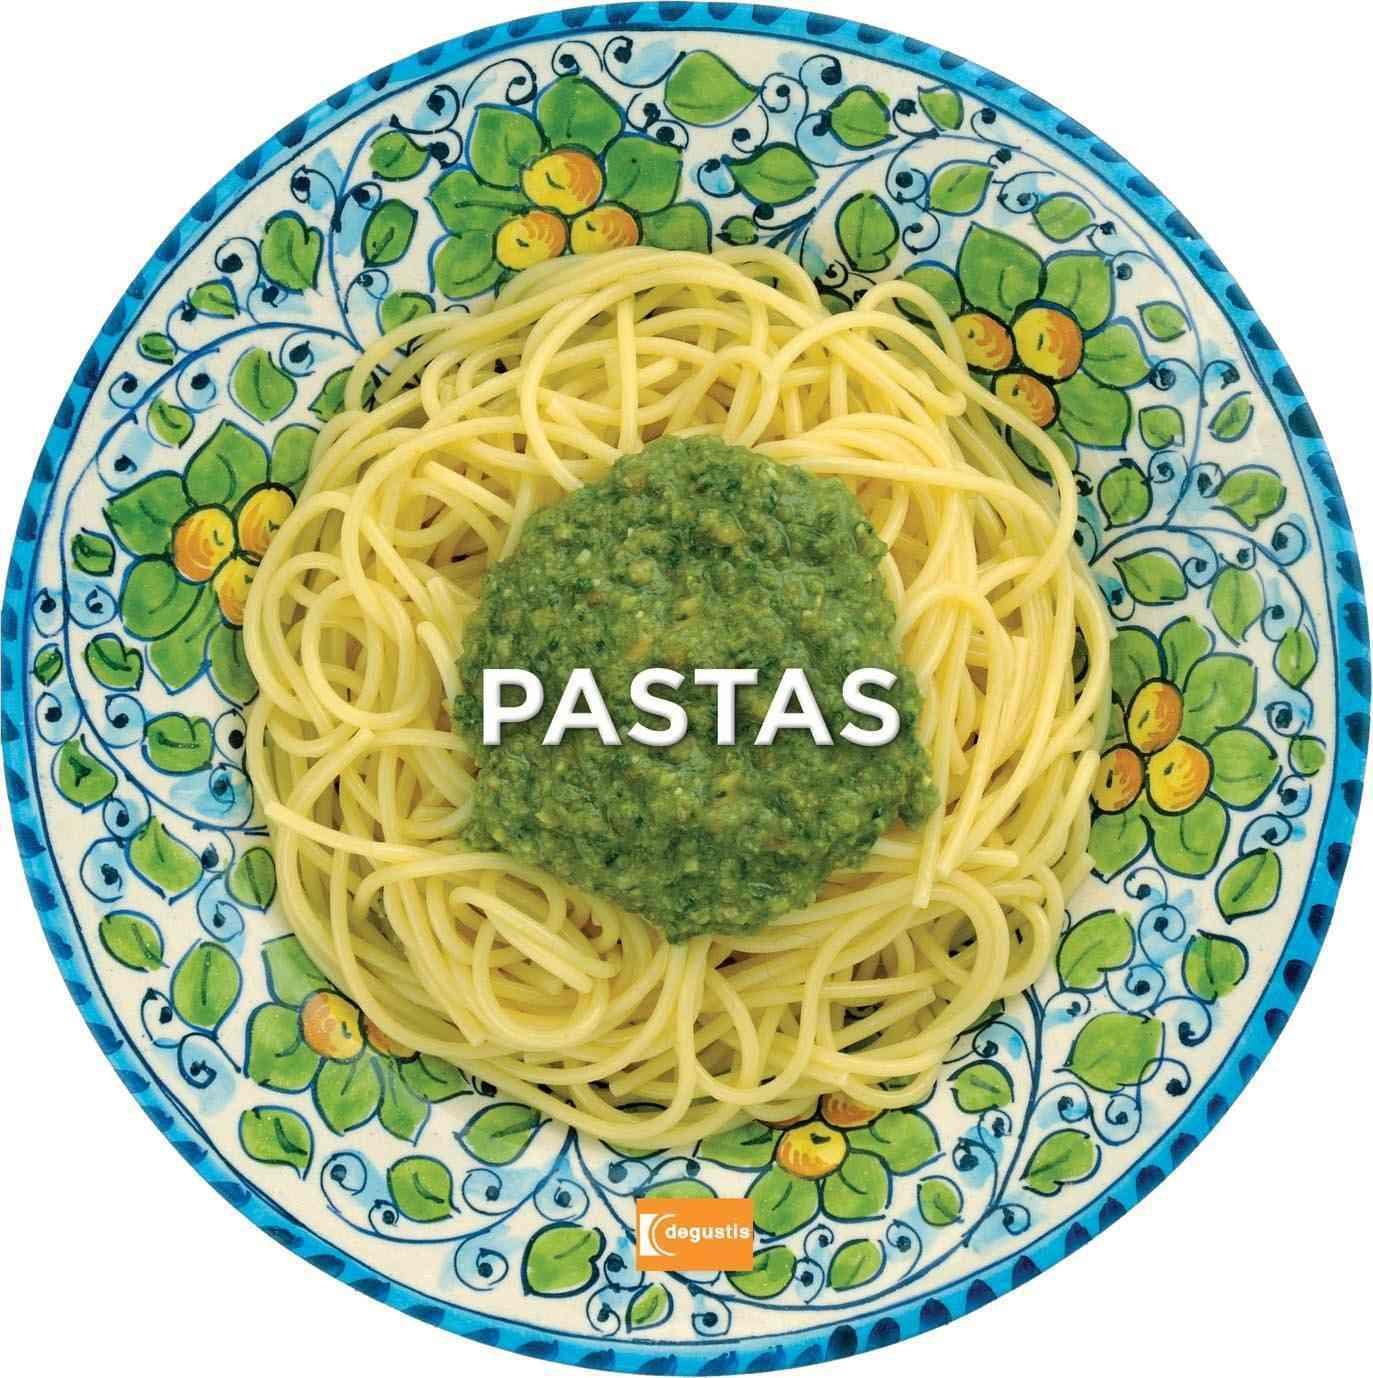 Scodella Pastas / Scodella Pasta By Bardi, Carla